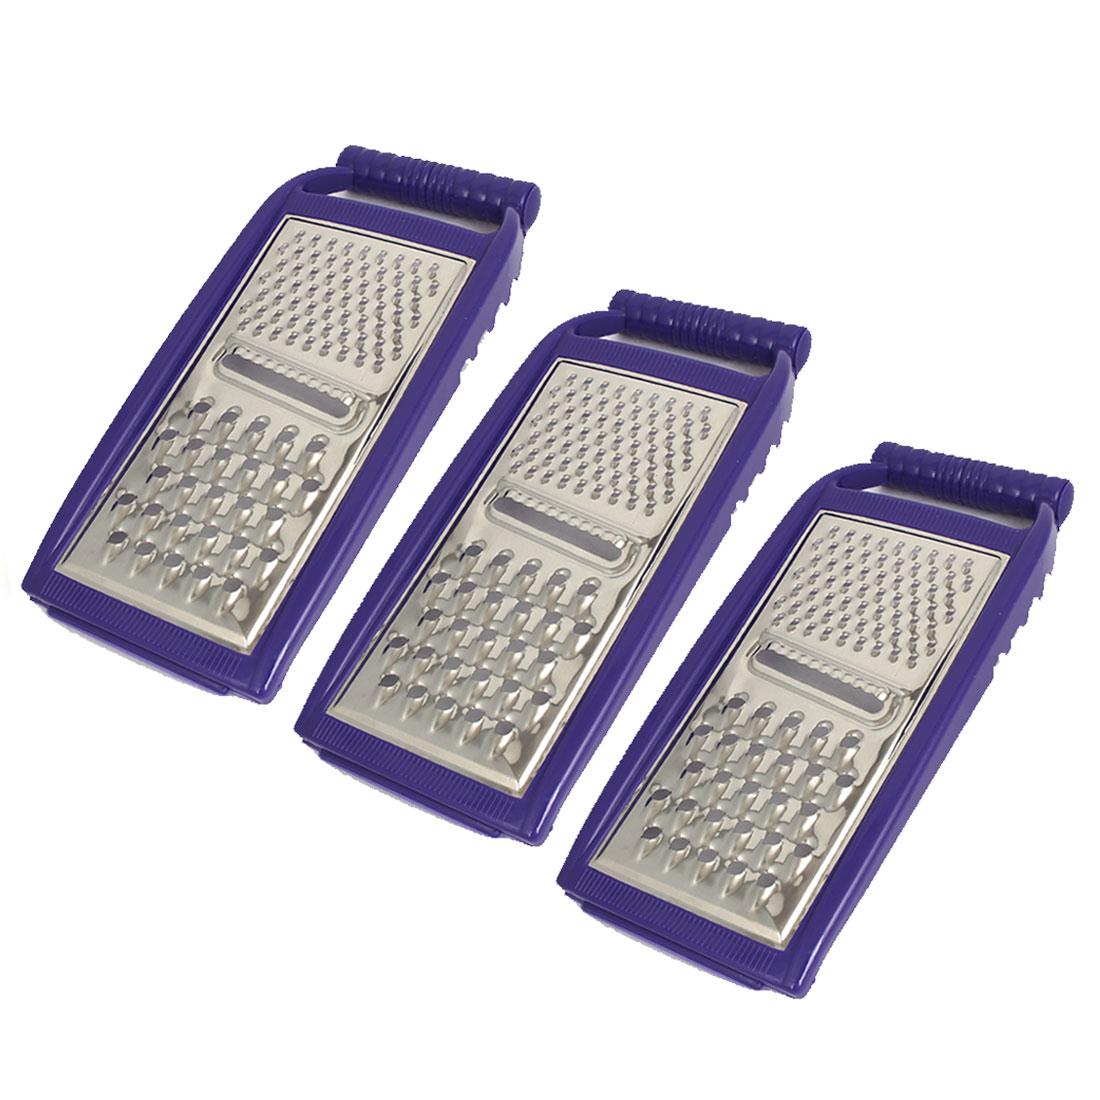 Blue Plastic Frame Metal Potato Carrot Shredder Grater Peeler Kitchenware 3pcs